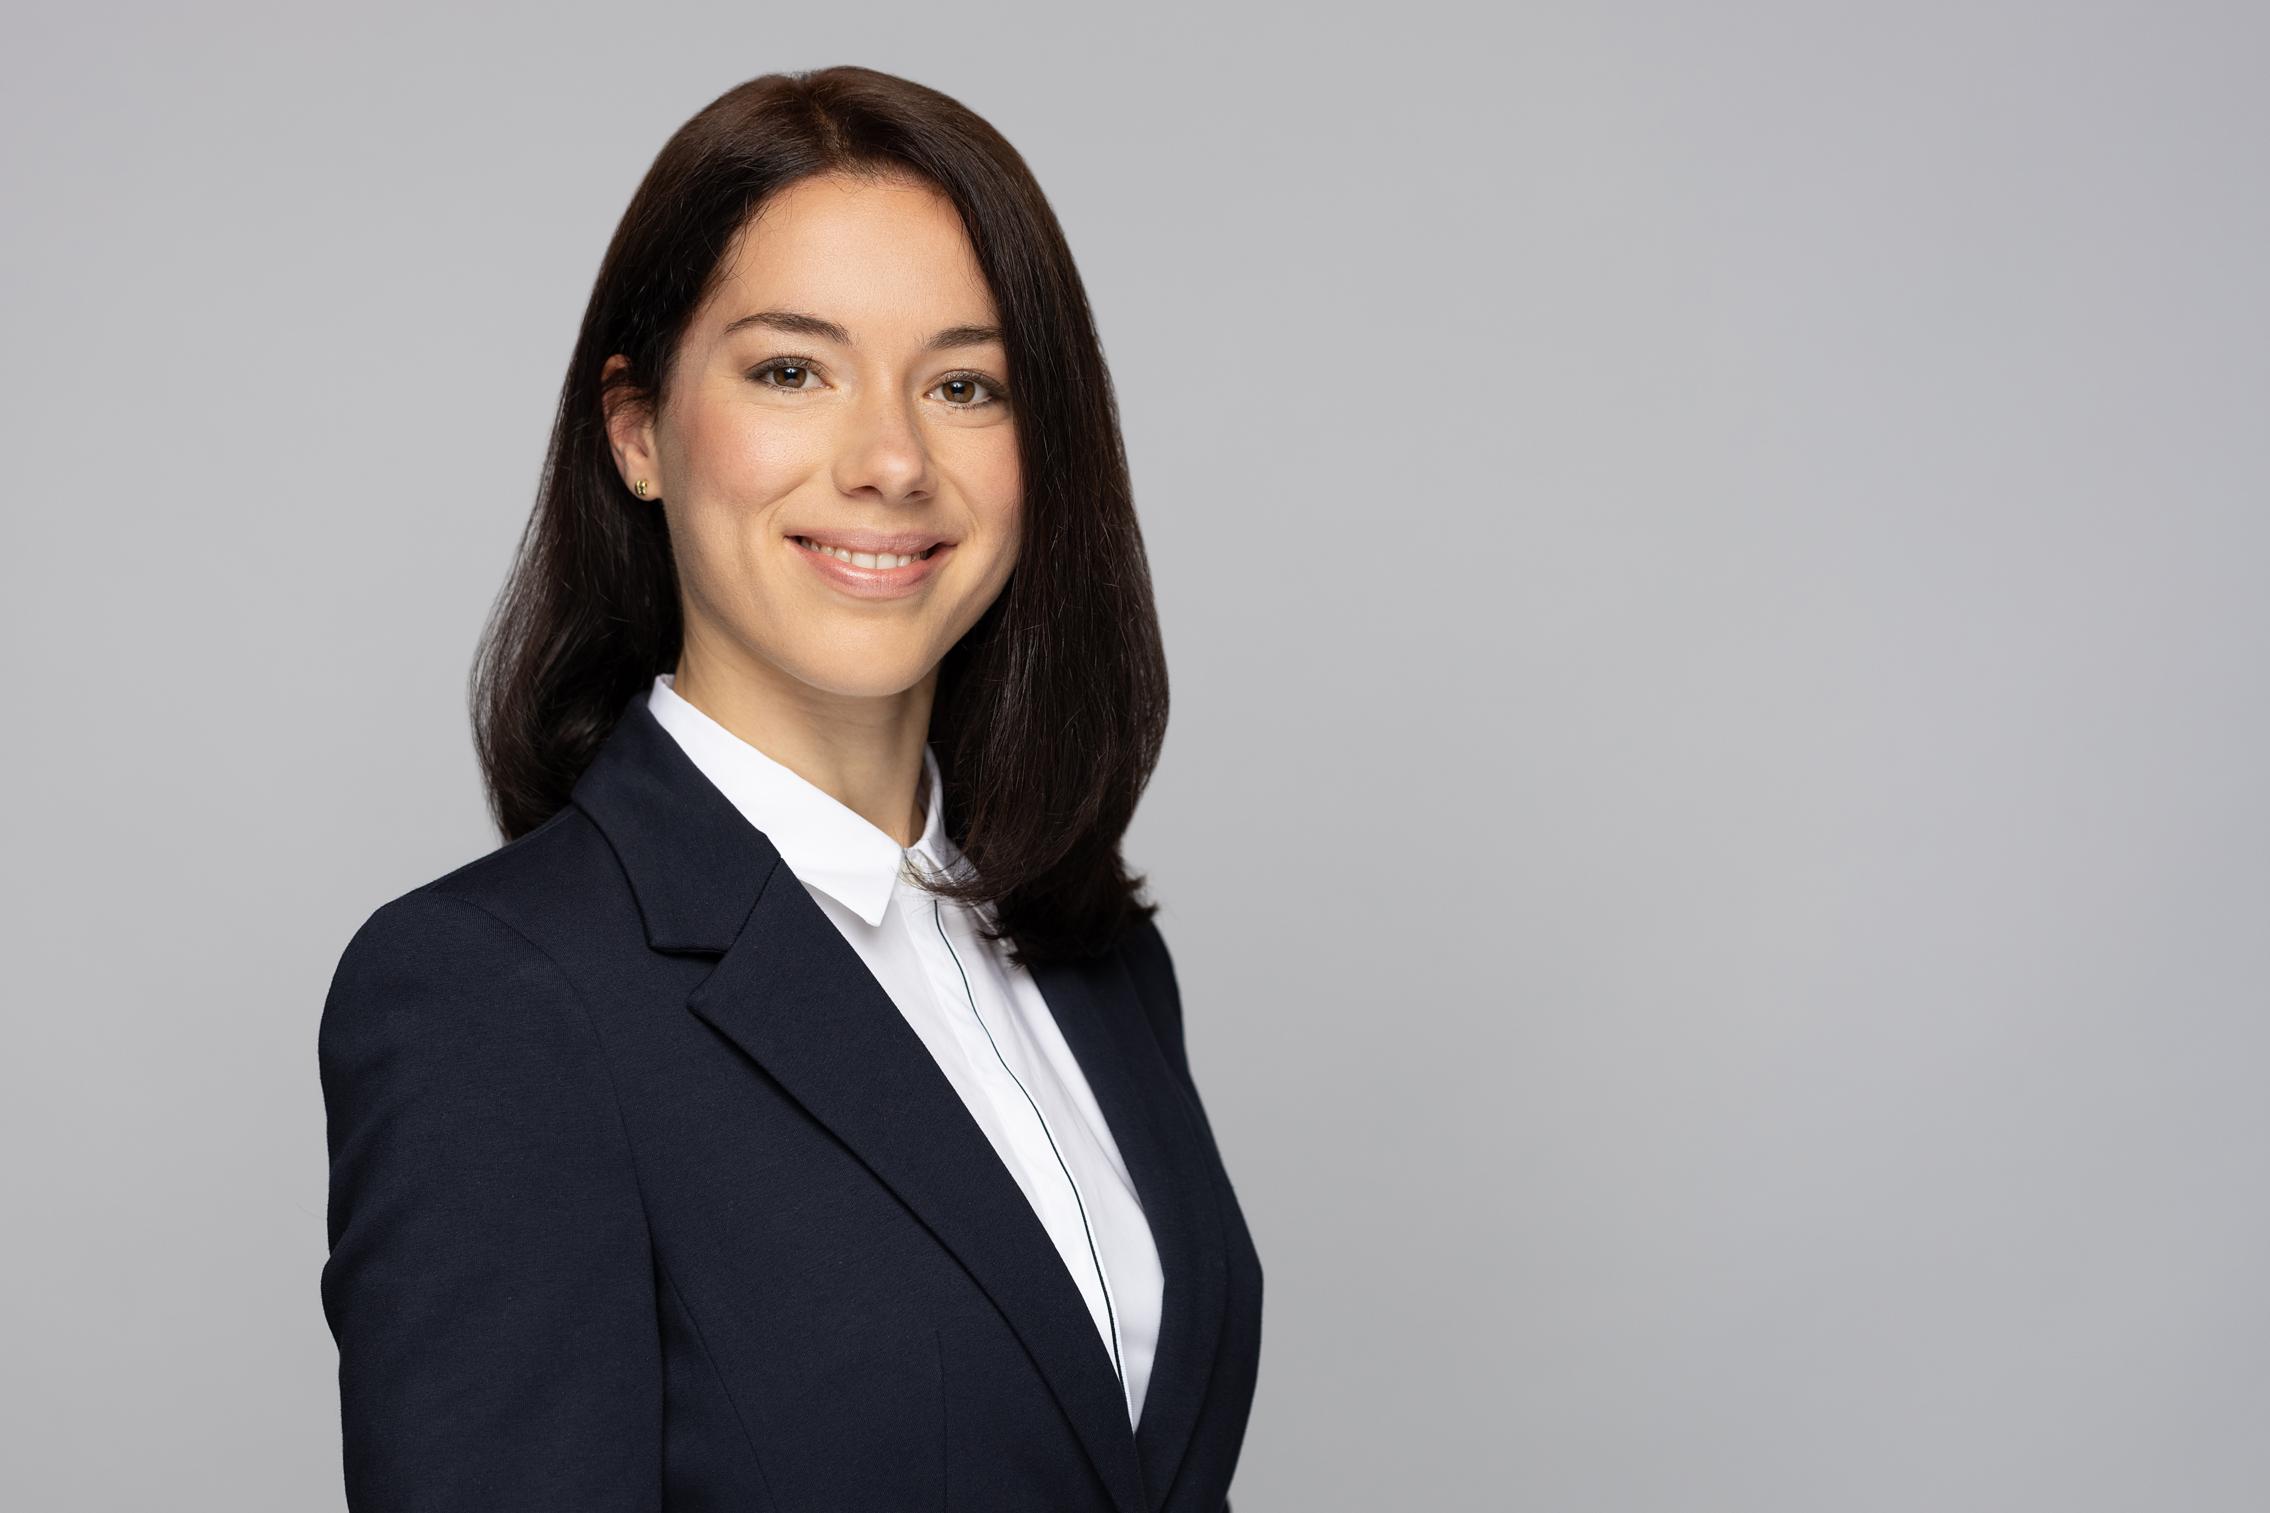 Katarina Nossakova